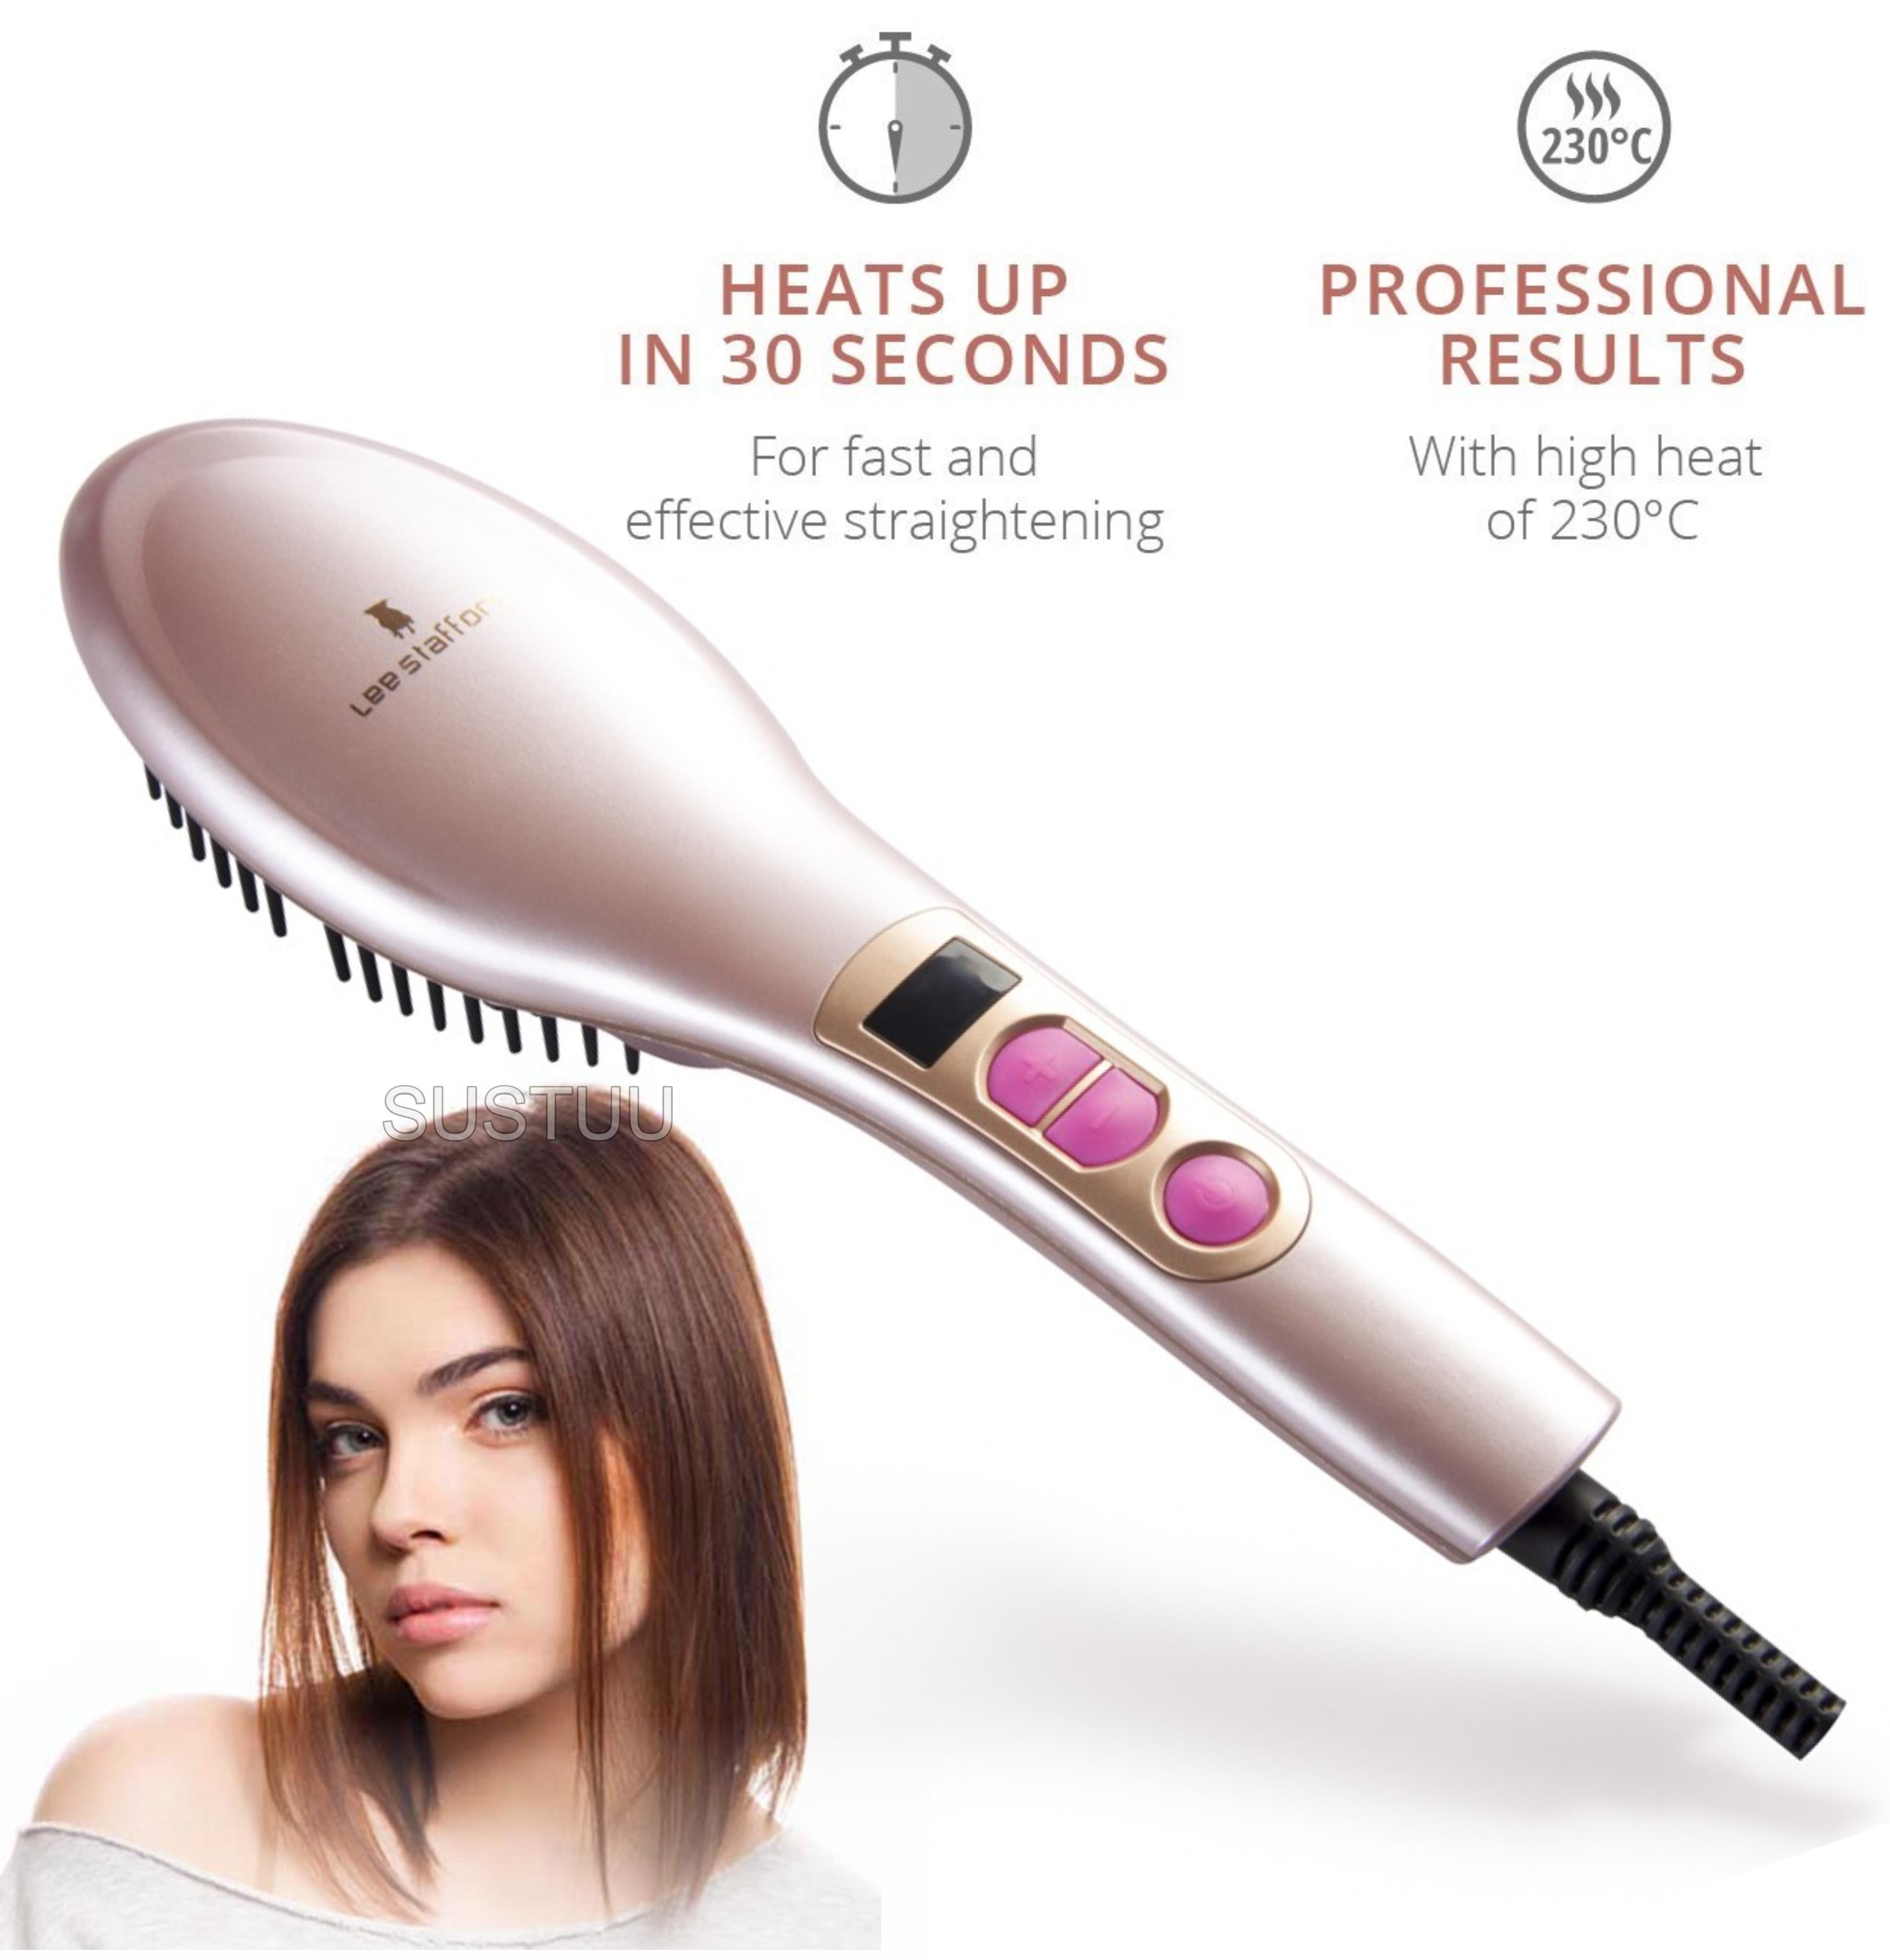 Lee Stafford Coco Loco Heated Hair Straightening Brush/Comb | Ceramic Plates | 230°C